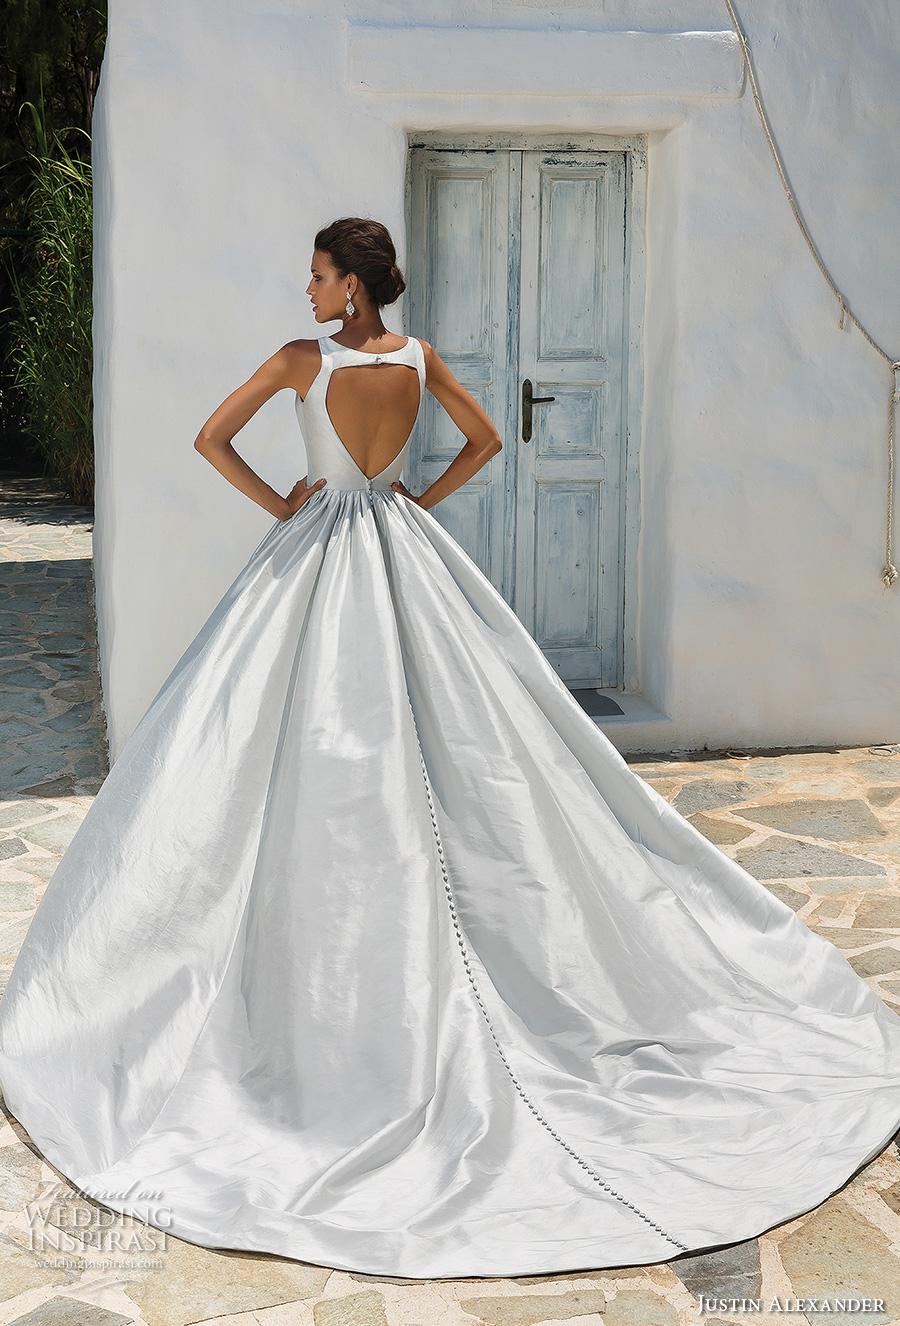 justin alexander 2018 bridal sleeveless deep v neck clean simple satin elegant sexy blue ball gown a line wedding dress with pockets keyhole back chapel train (3) bv